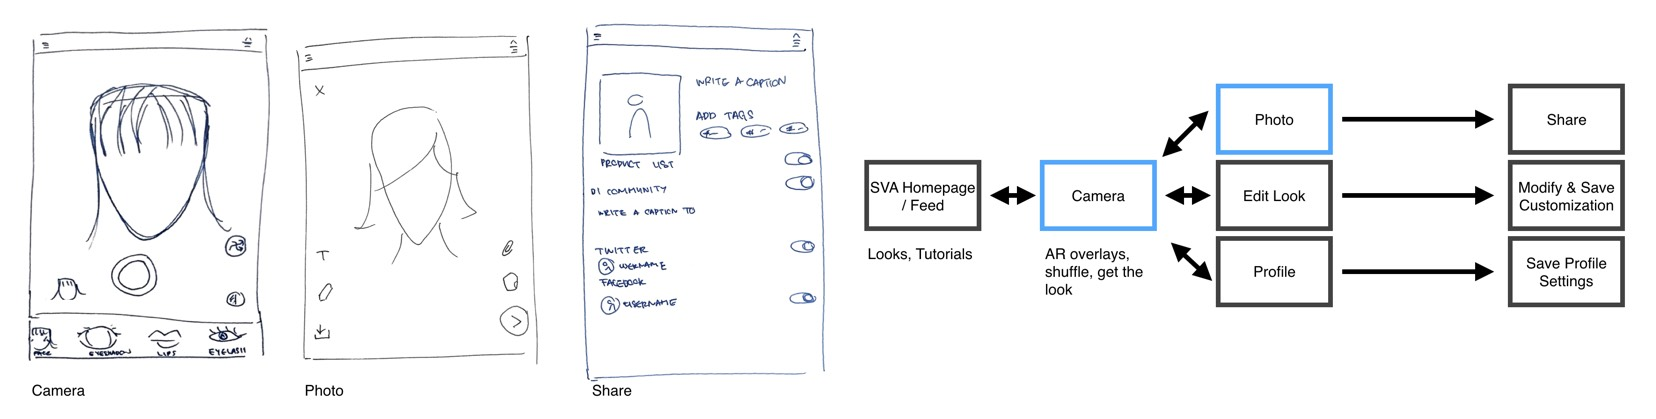 sephora-flow-sketch1